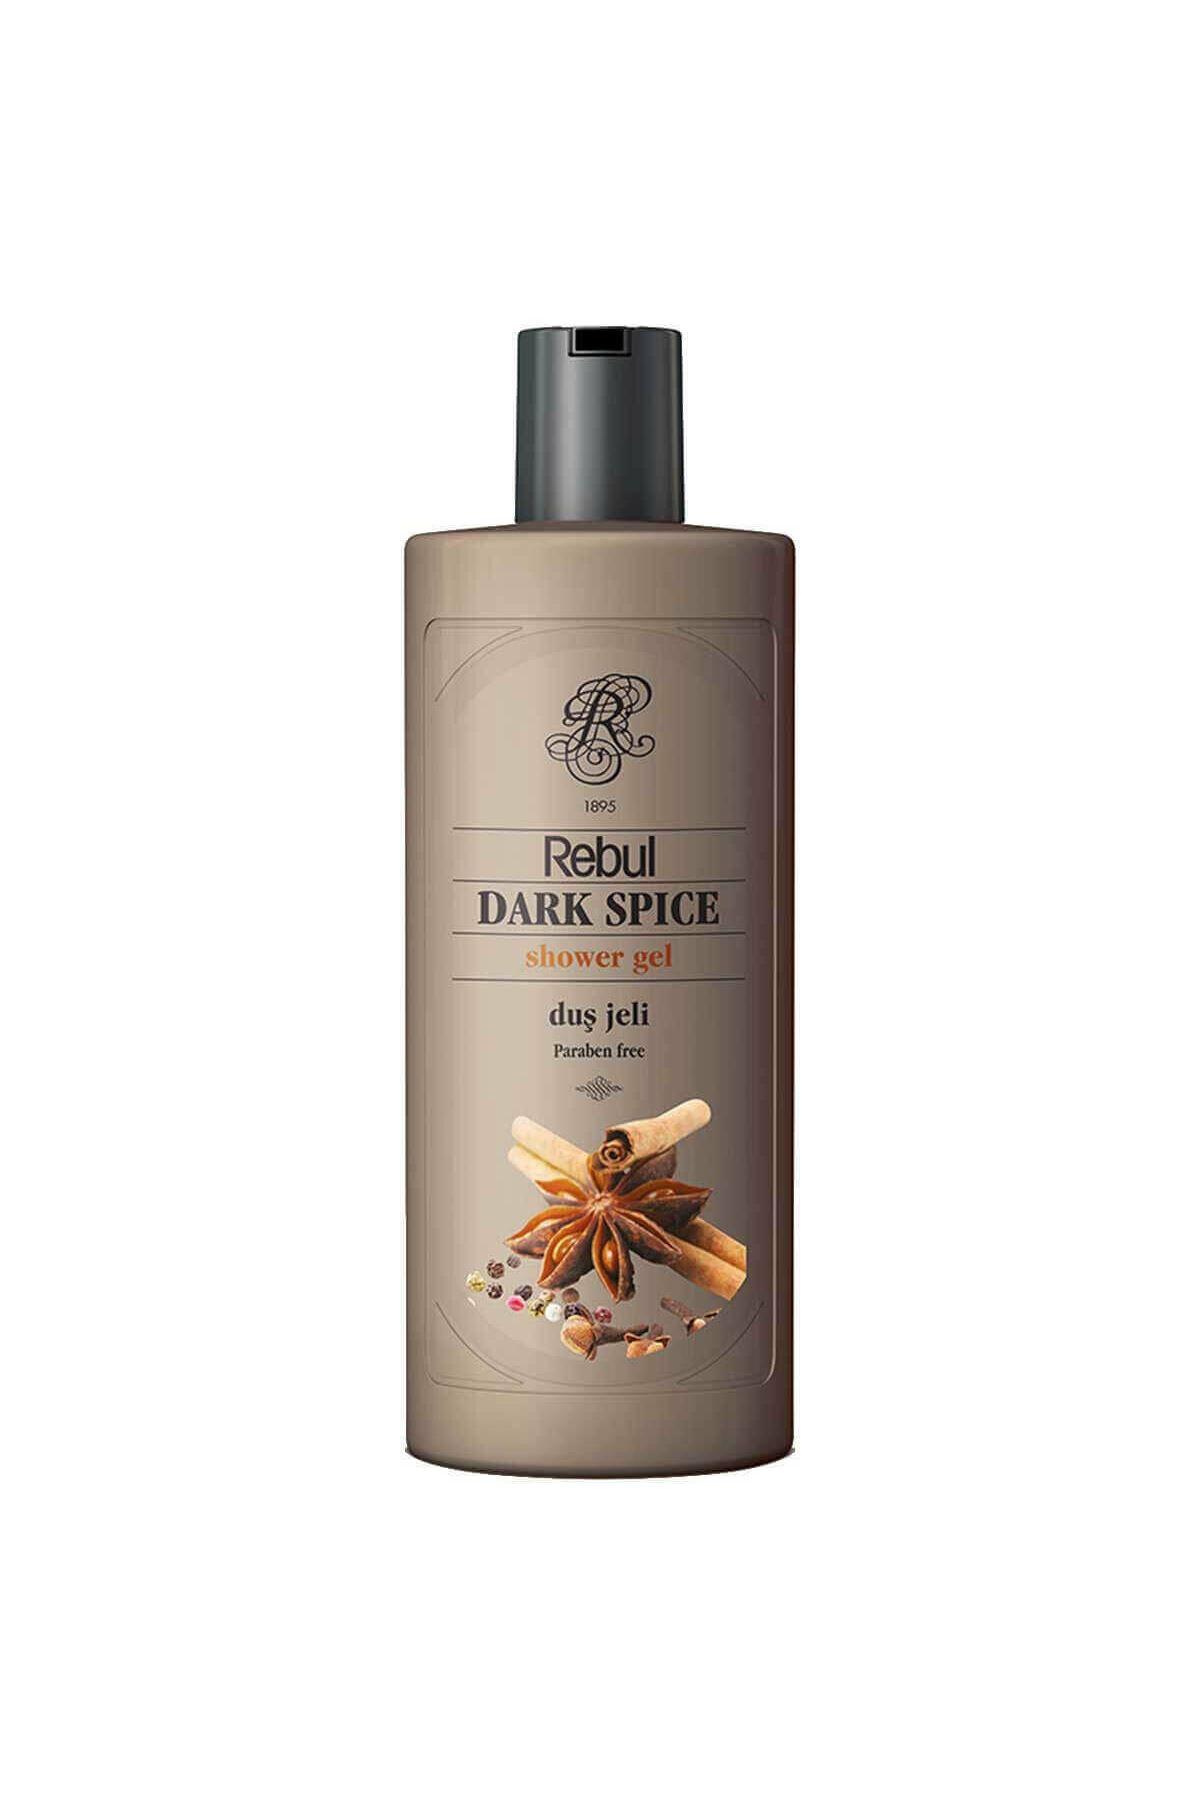 Rebul Duş Jeli Dark Spice 500 ML